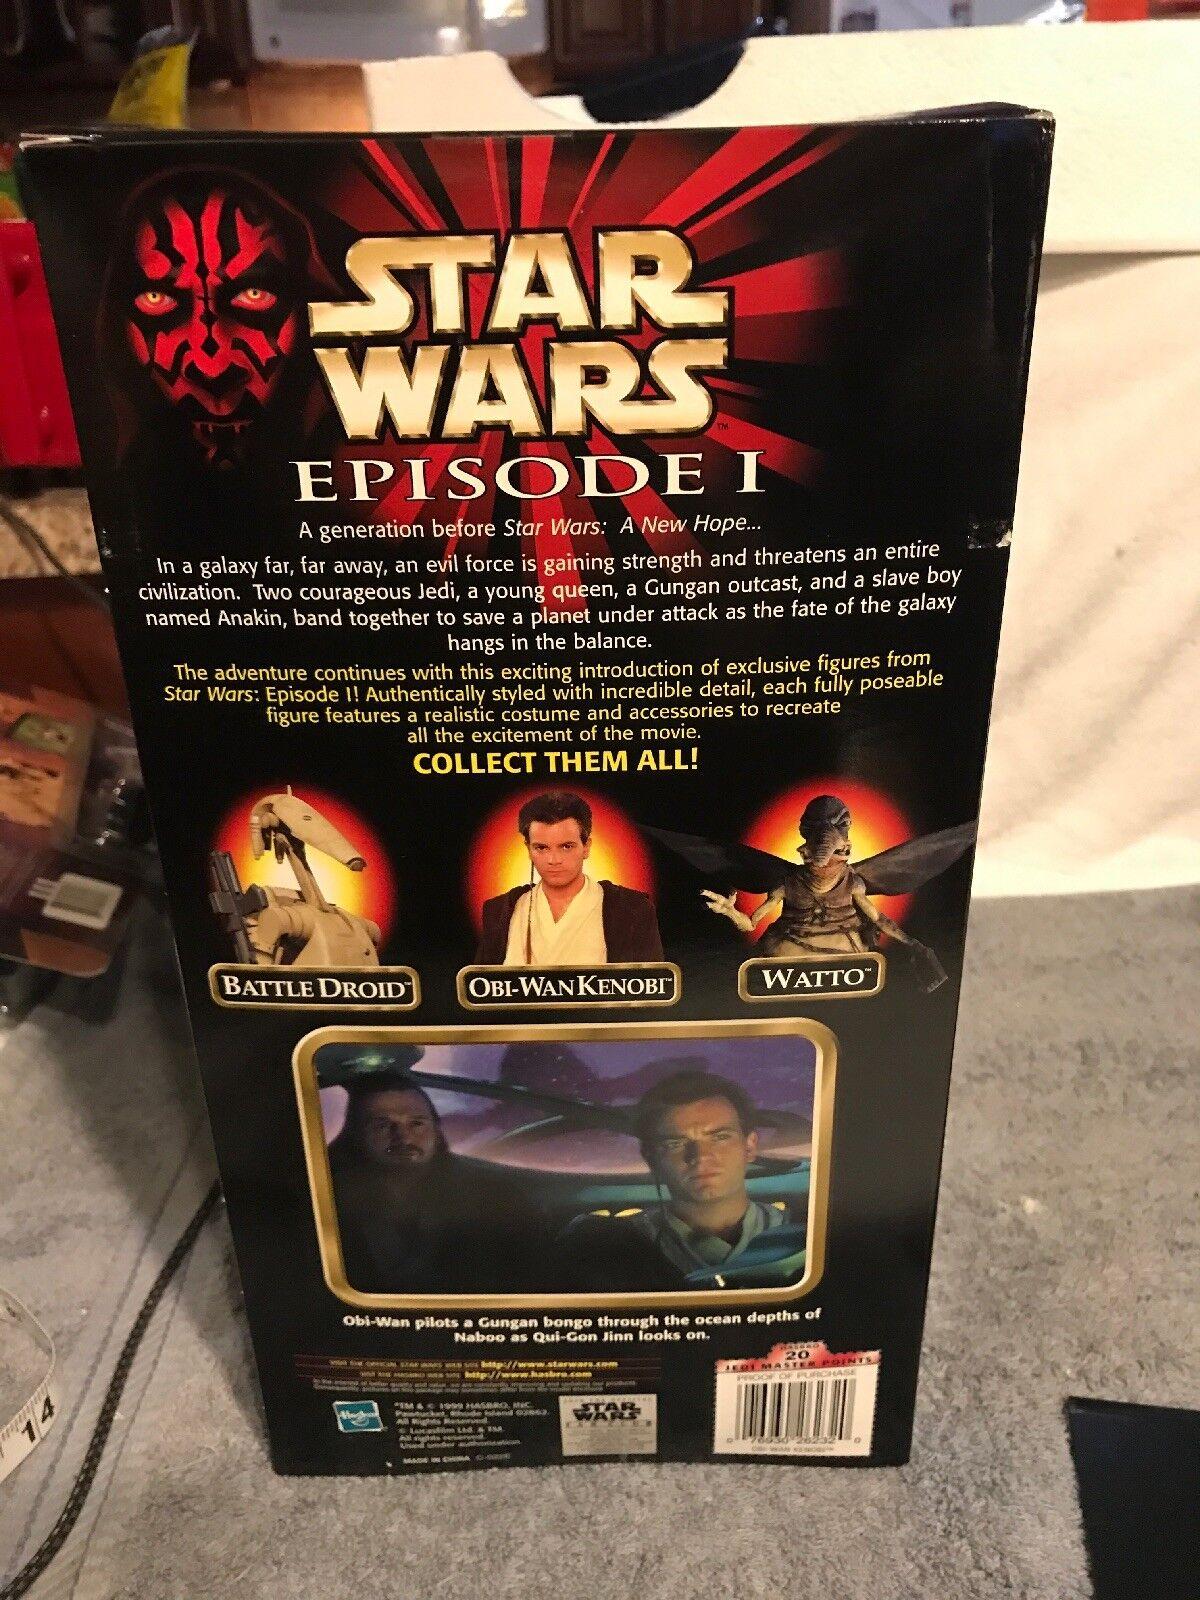 Star Wars Episode 1 Obi-Wan-Kenobi 12  Figure Figure Figure Hasbro 1999 With Plastic Case a8f6af